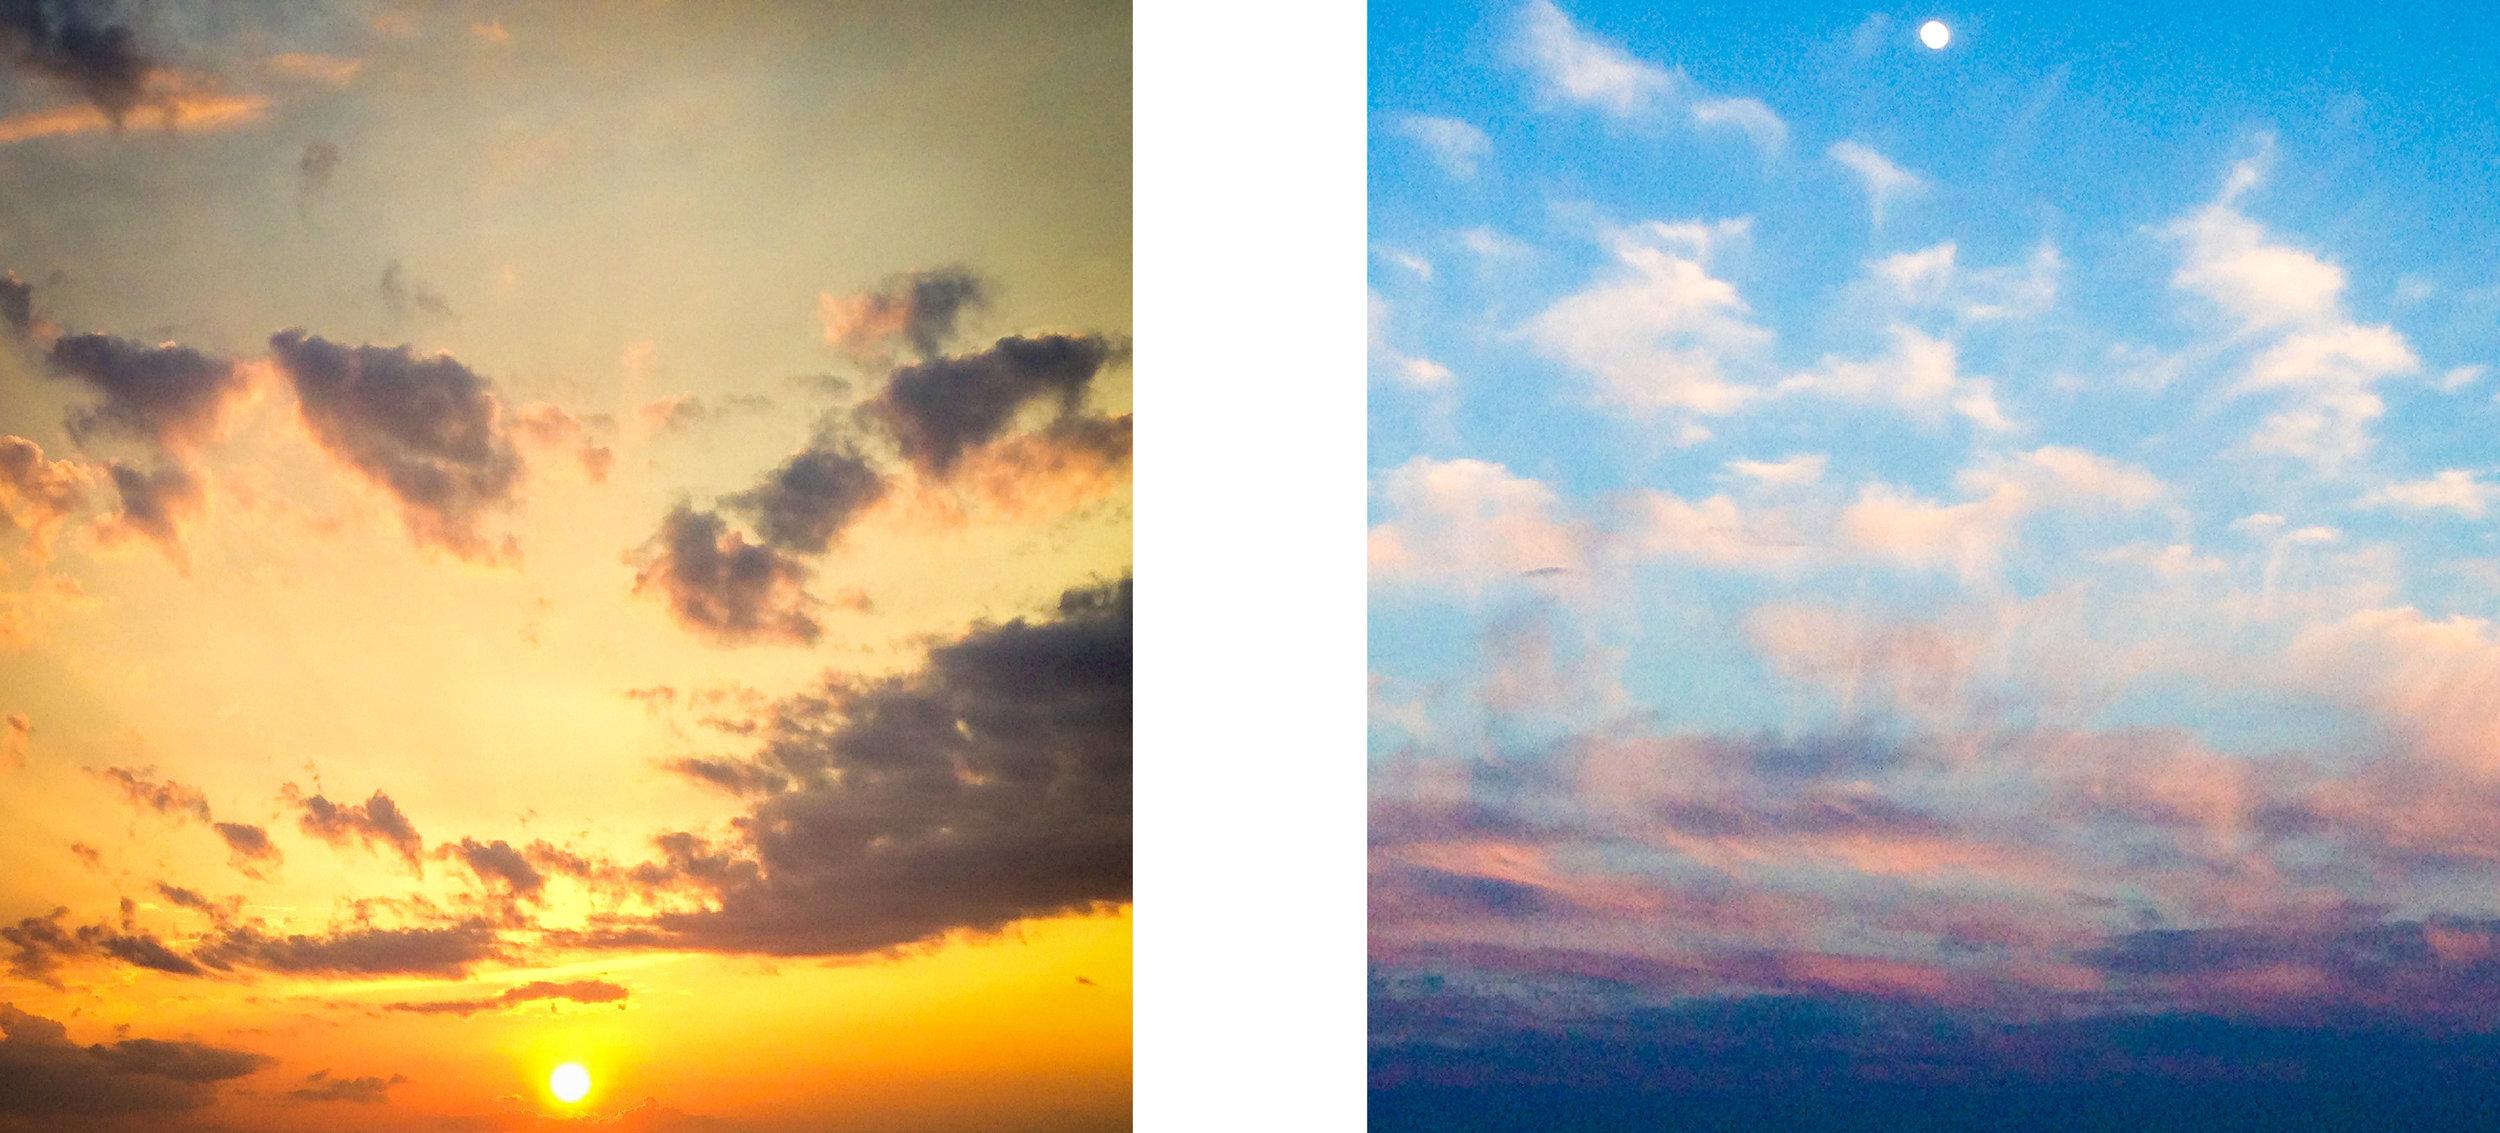 cloud diptych-01-01-01.jpg